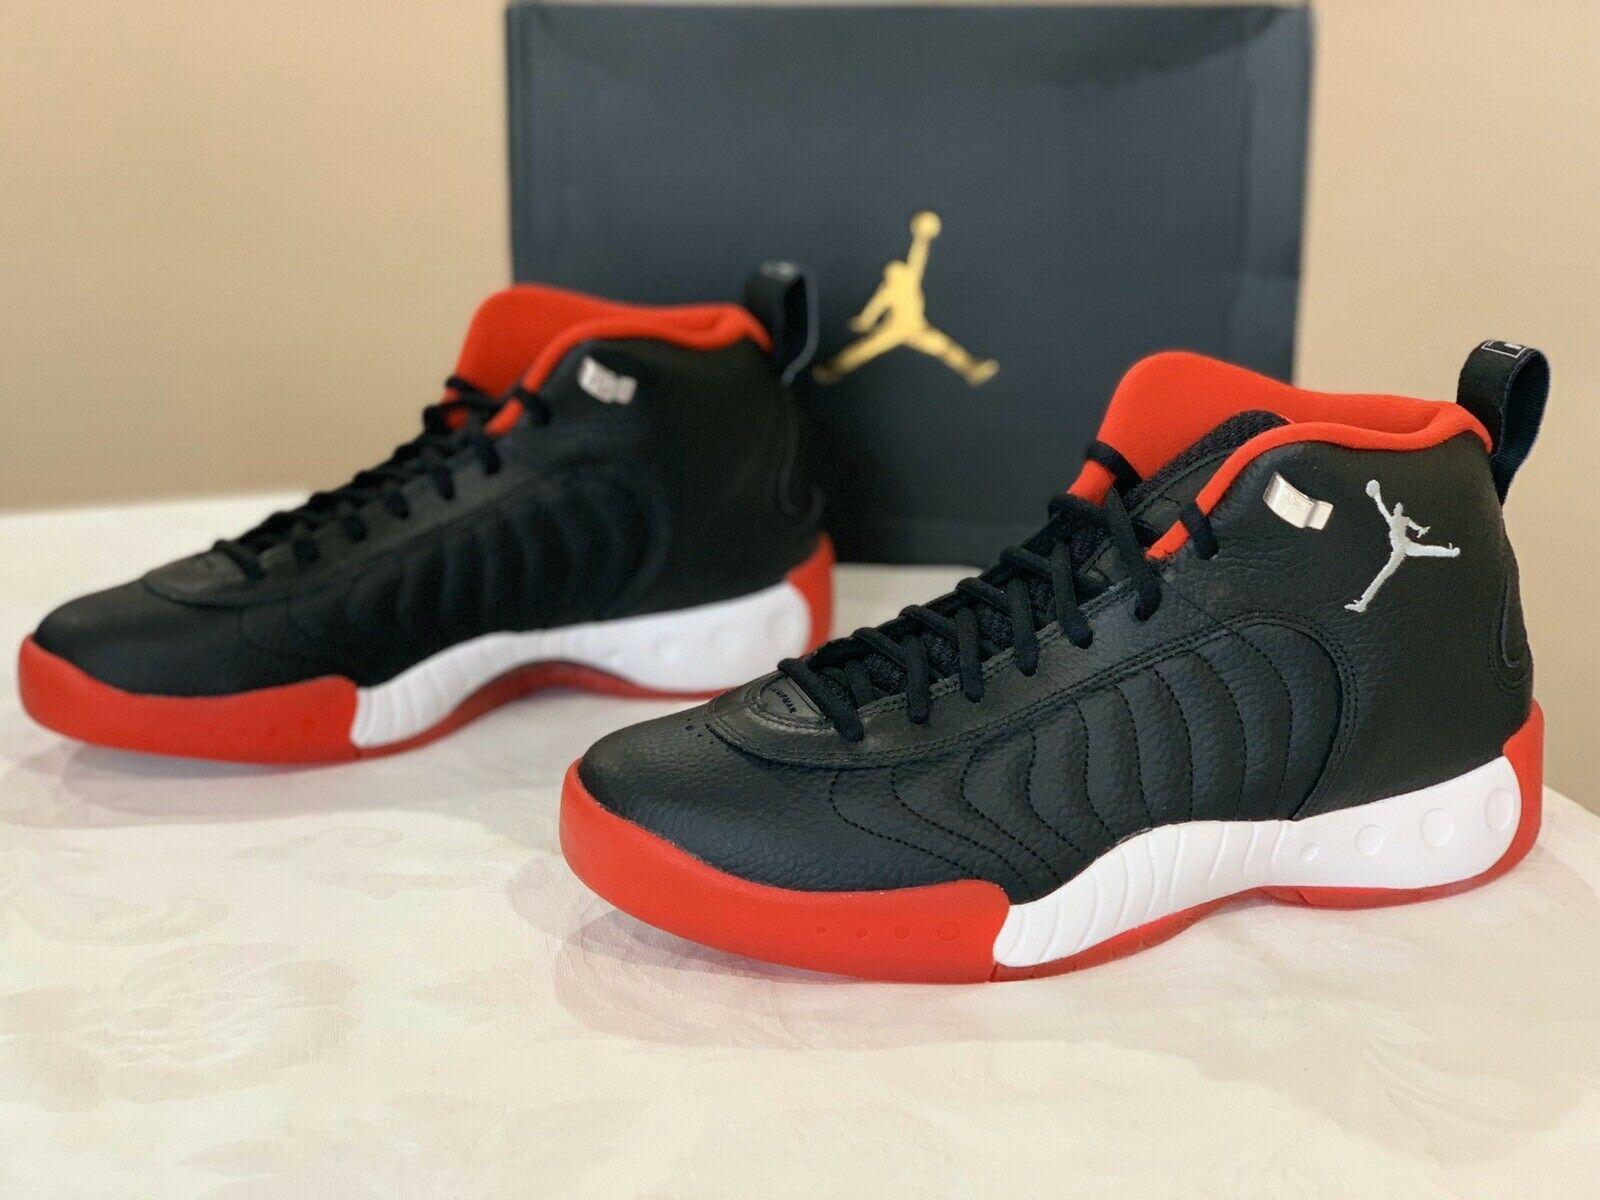 Details About Air Jordan Jumpman Pro Bred Basketball Shoes Size